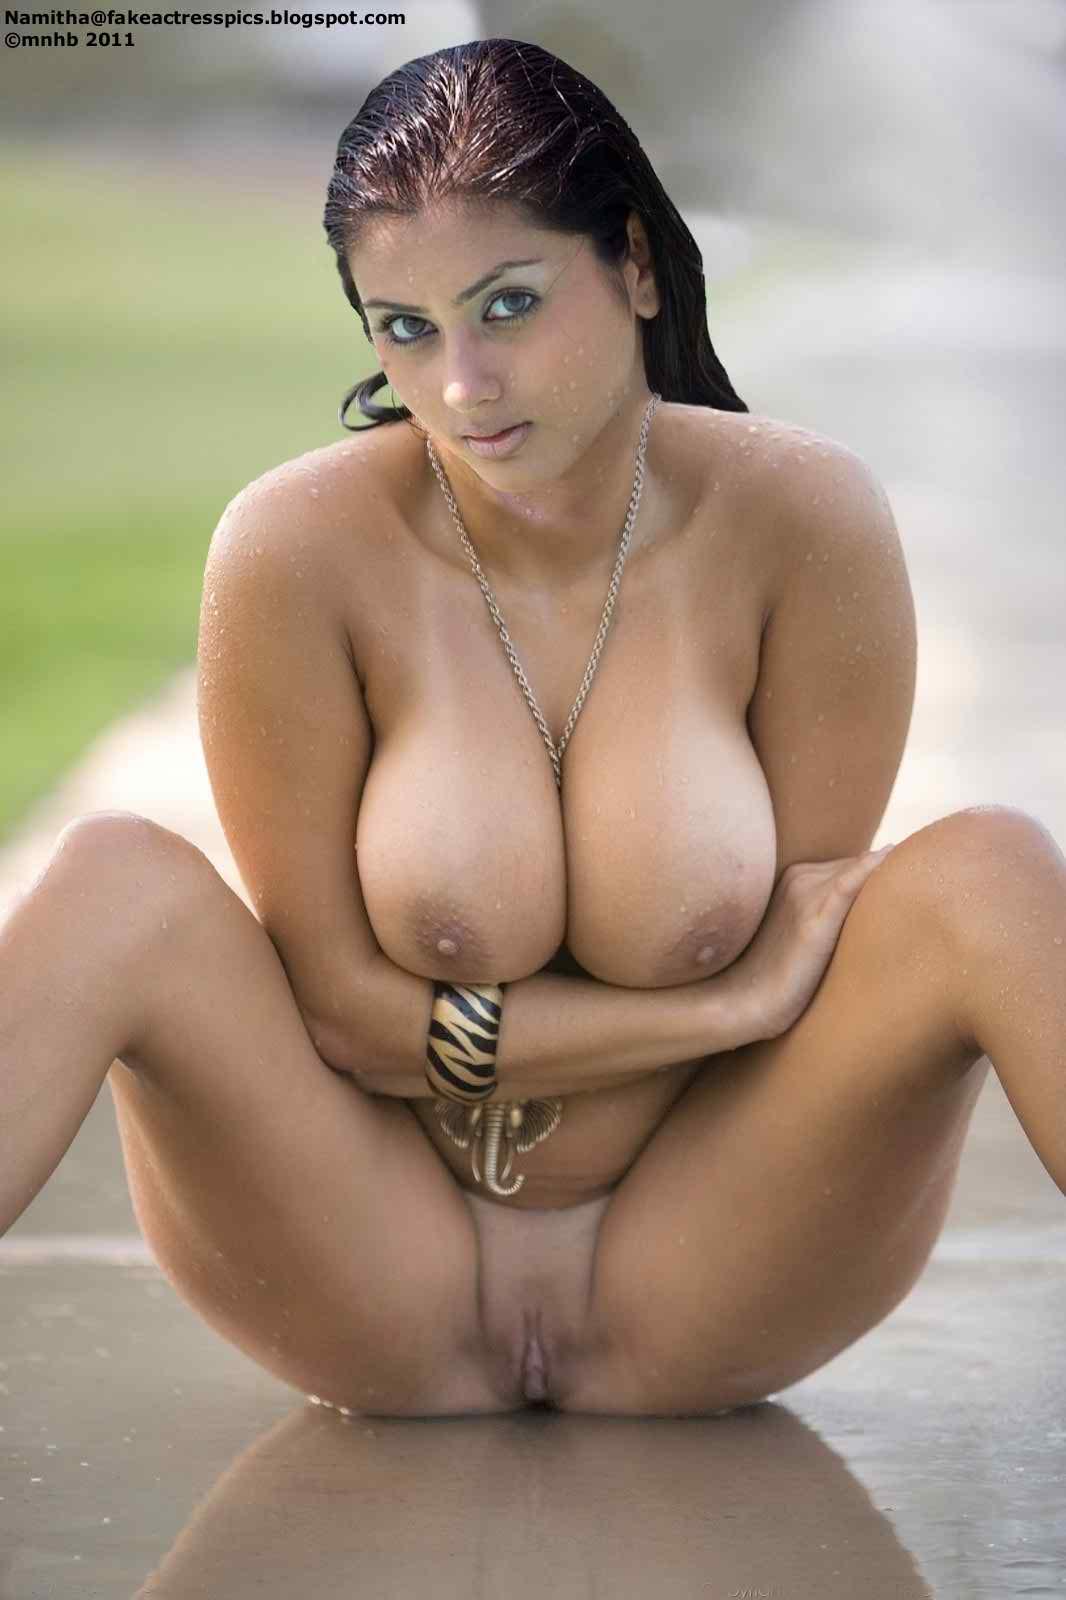 namitha nude boobs, namitha fake nude pics | pornstar magazines